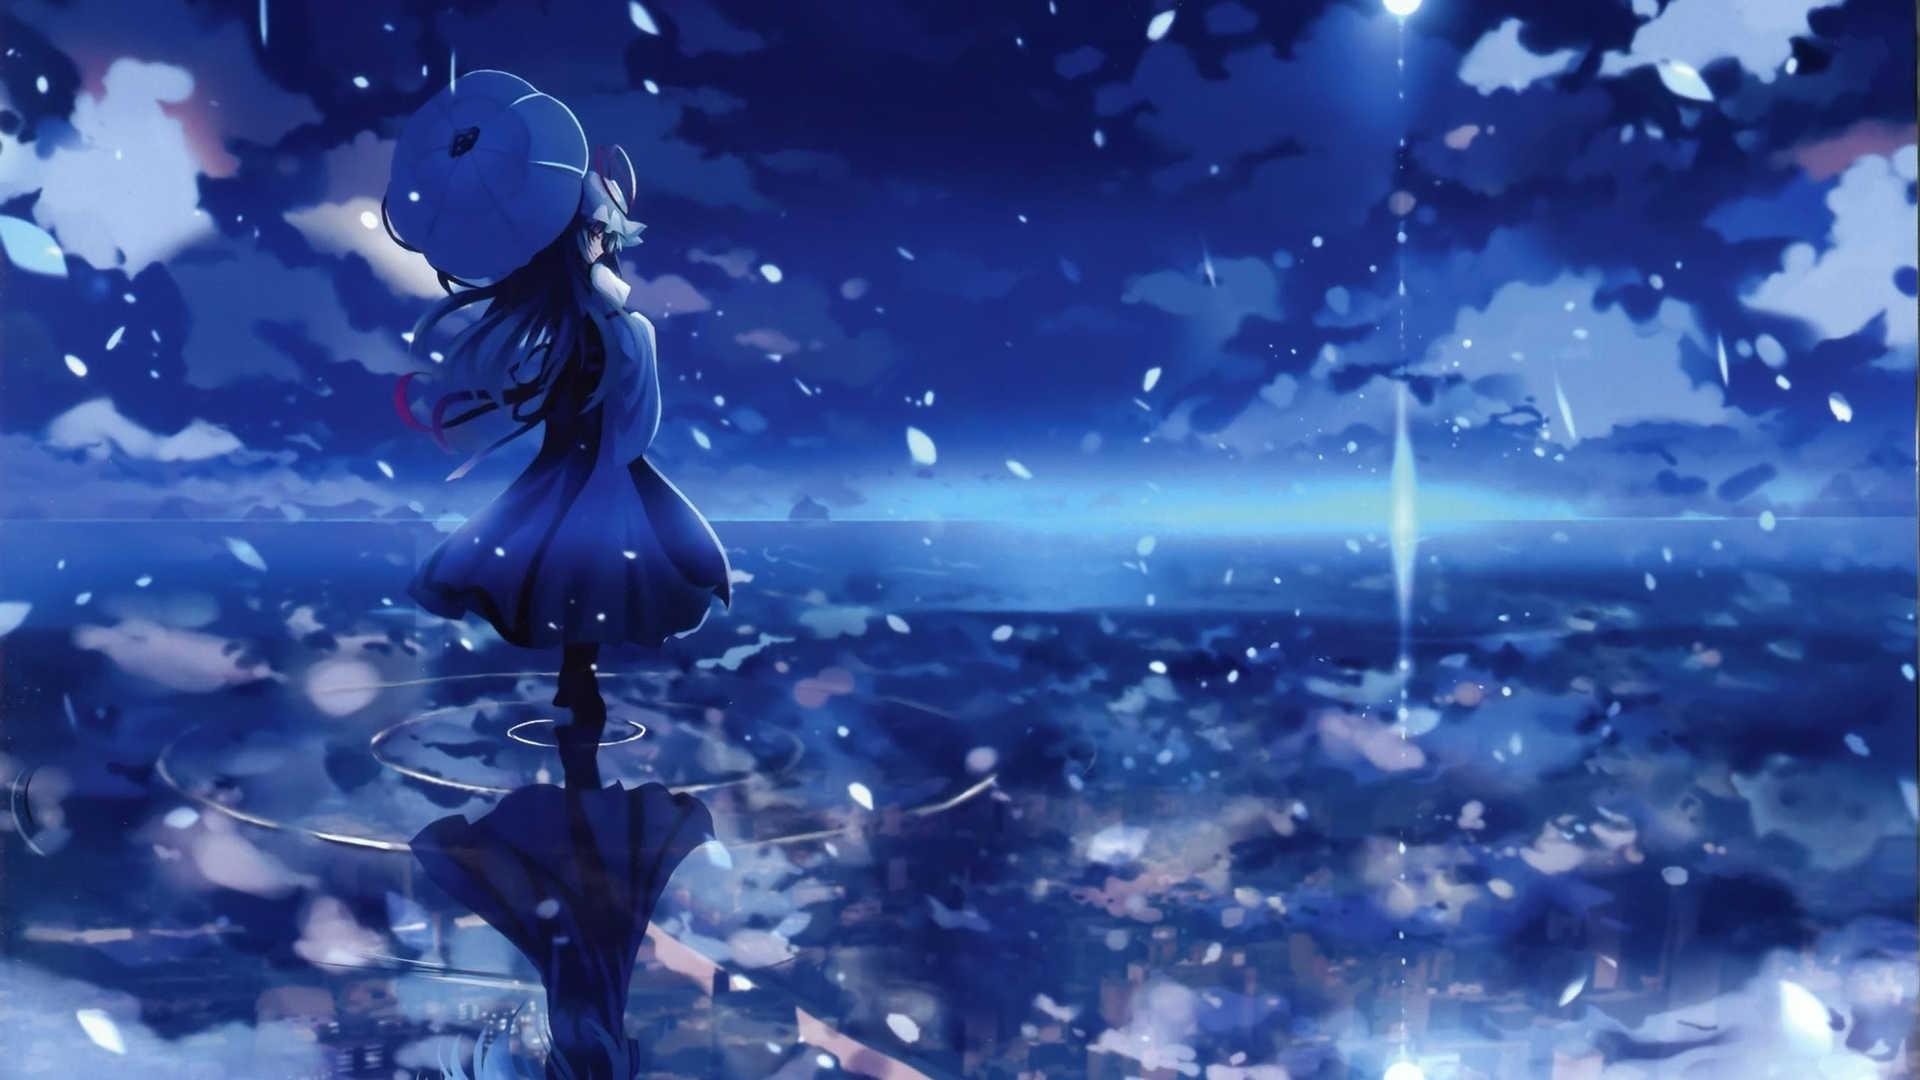 Wallpaper Girl Background Sword Image Touhou